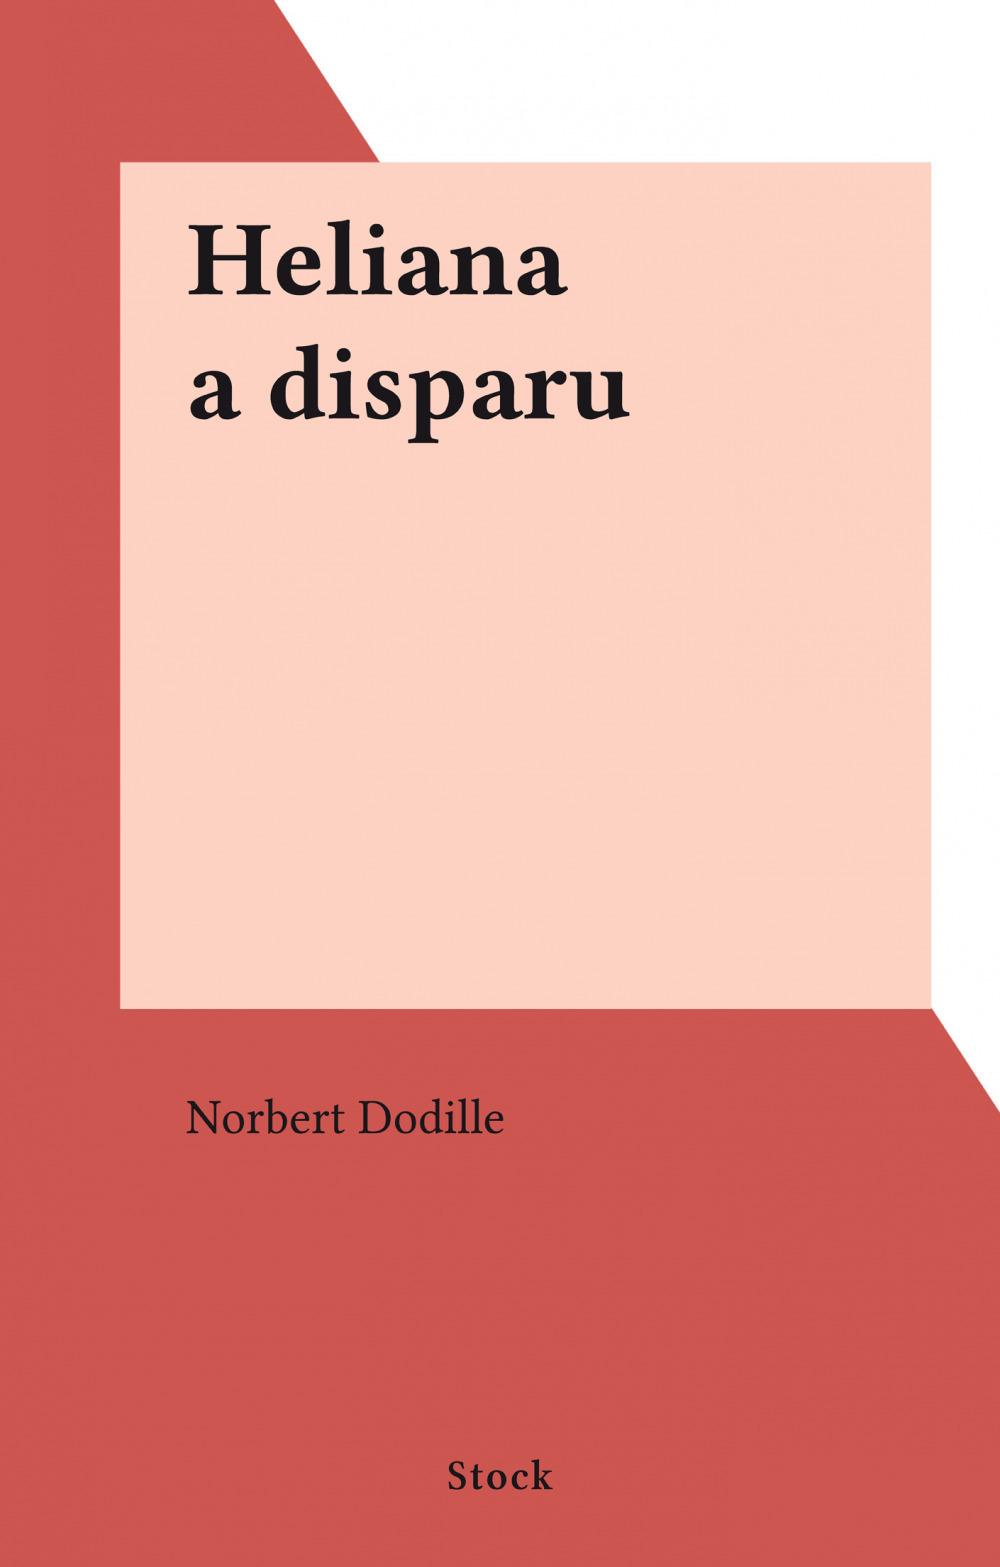 Heliana a disparu  - Norbert Dodille